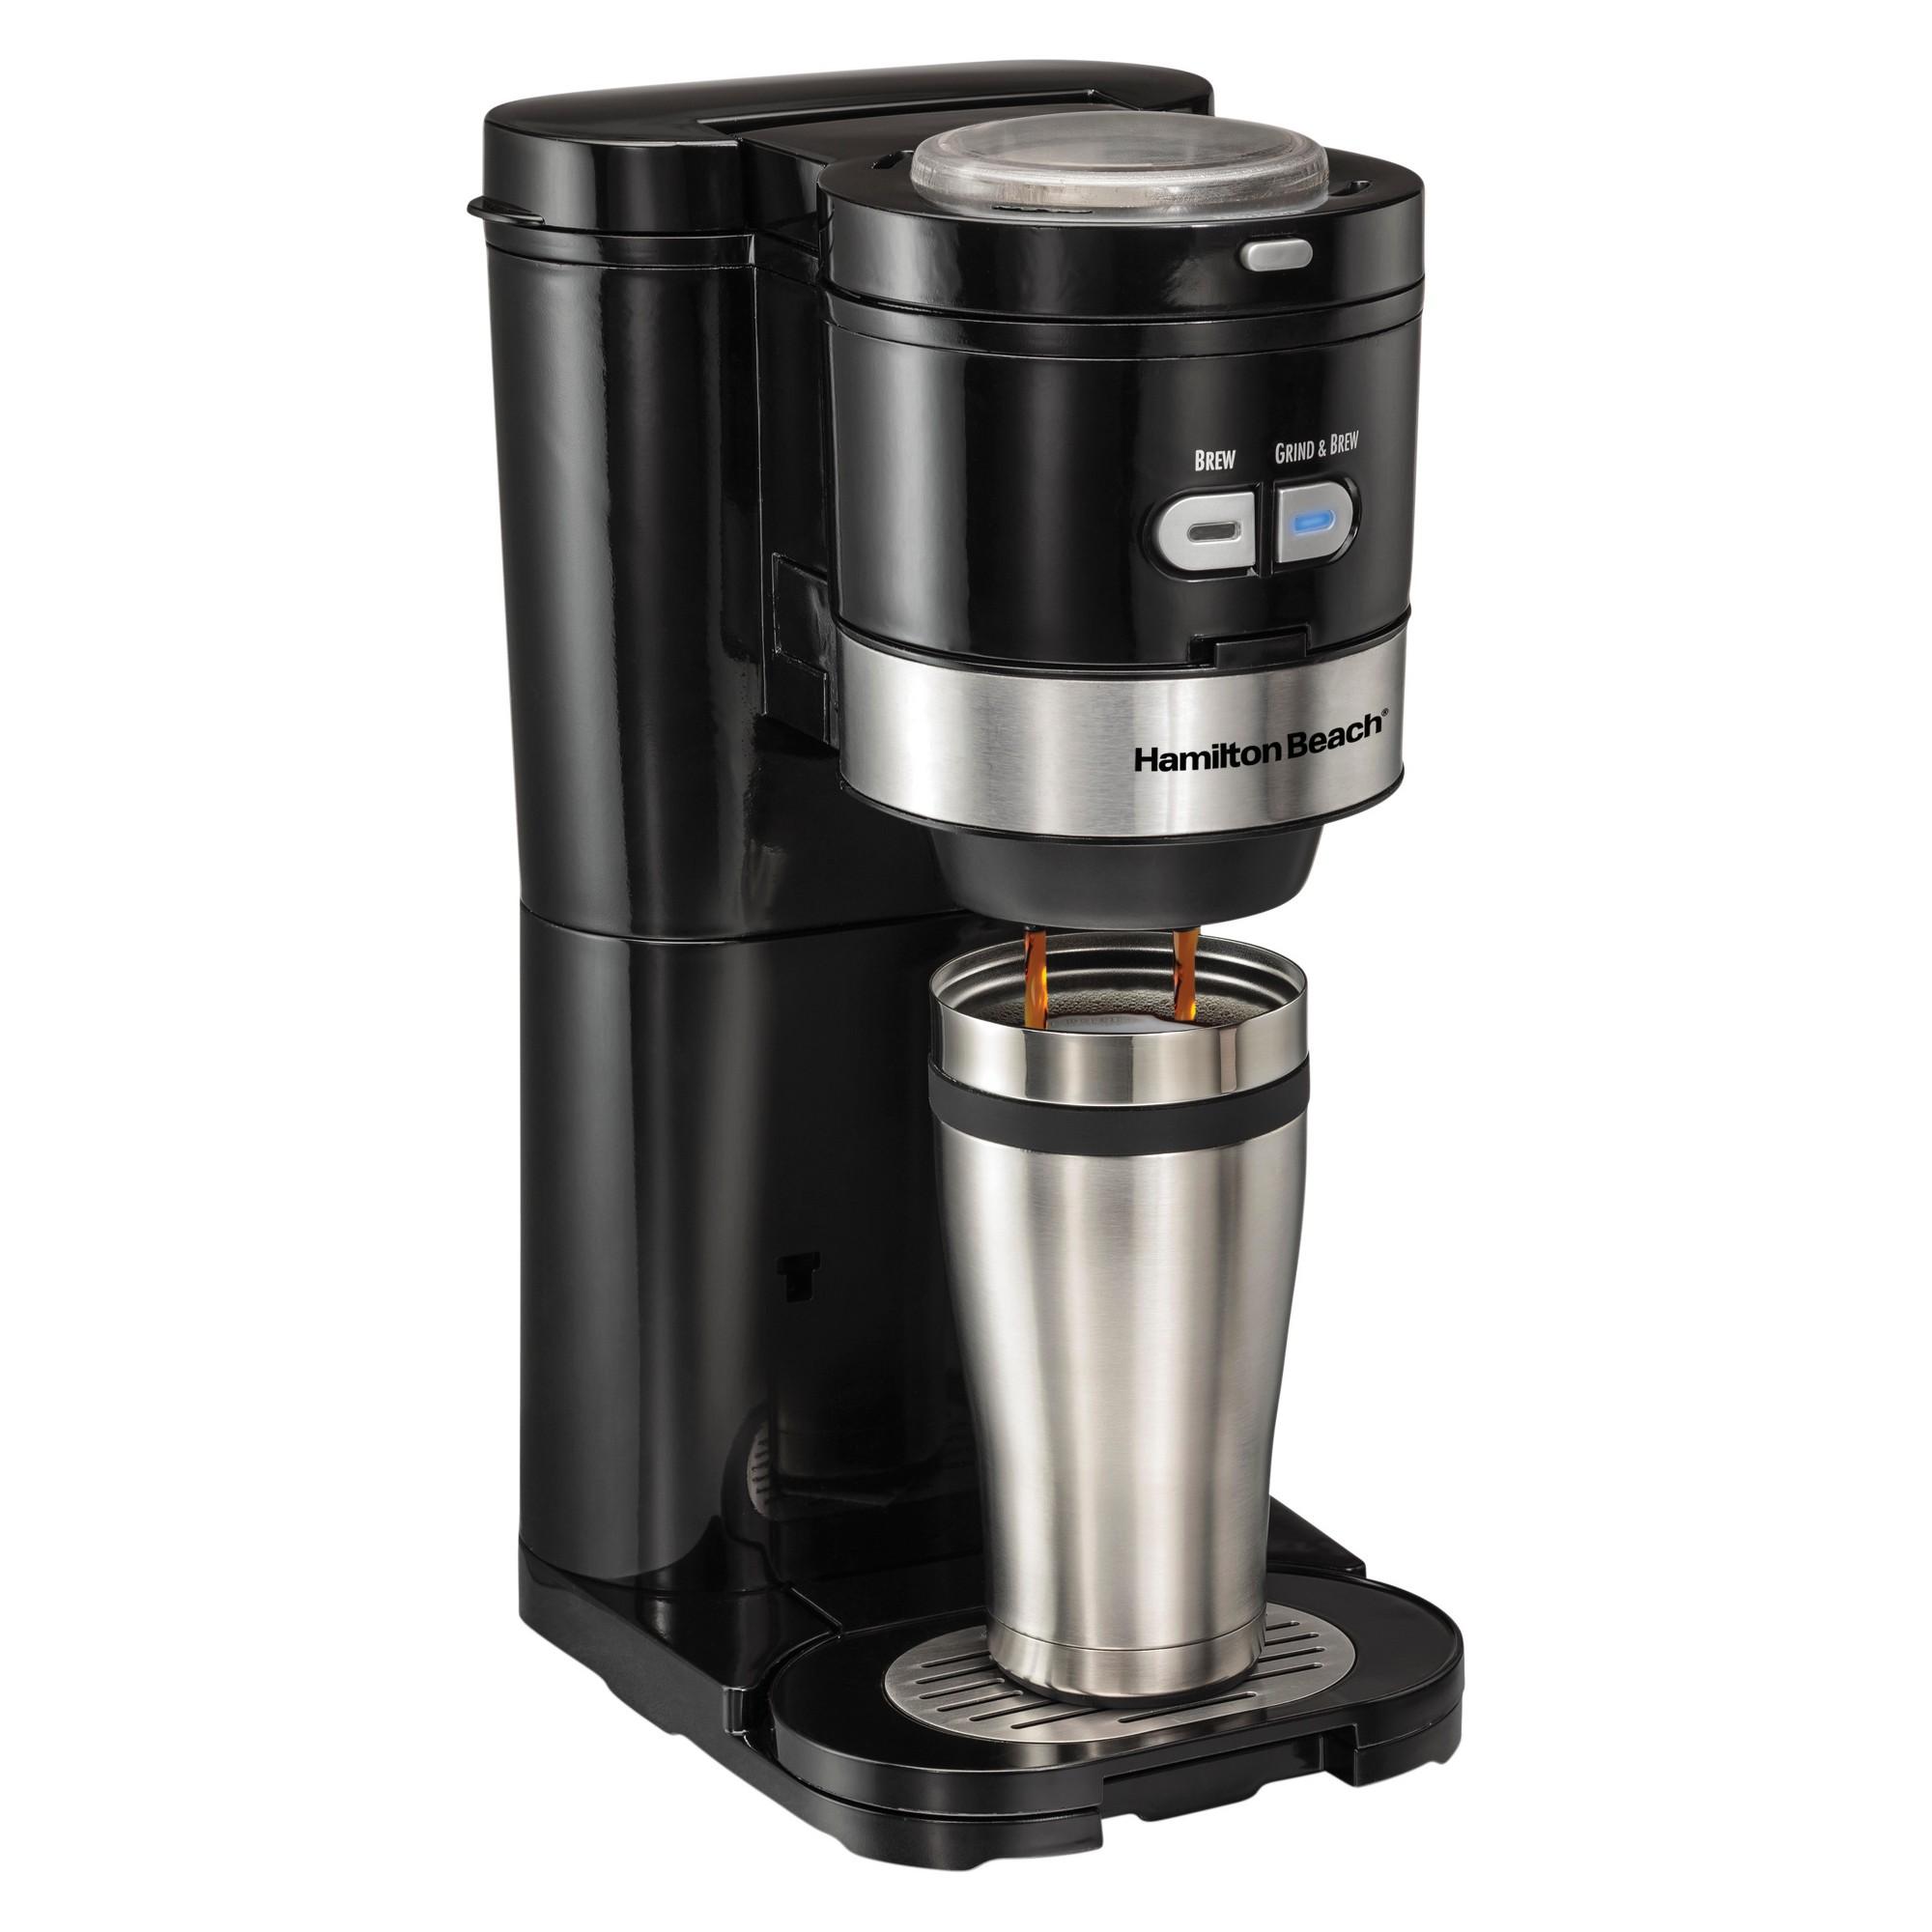 Hamilton Beach Grind and Brew SingleServe Coffee Maker